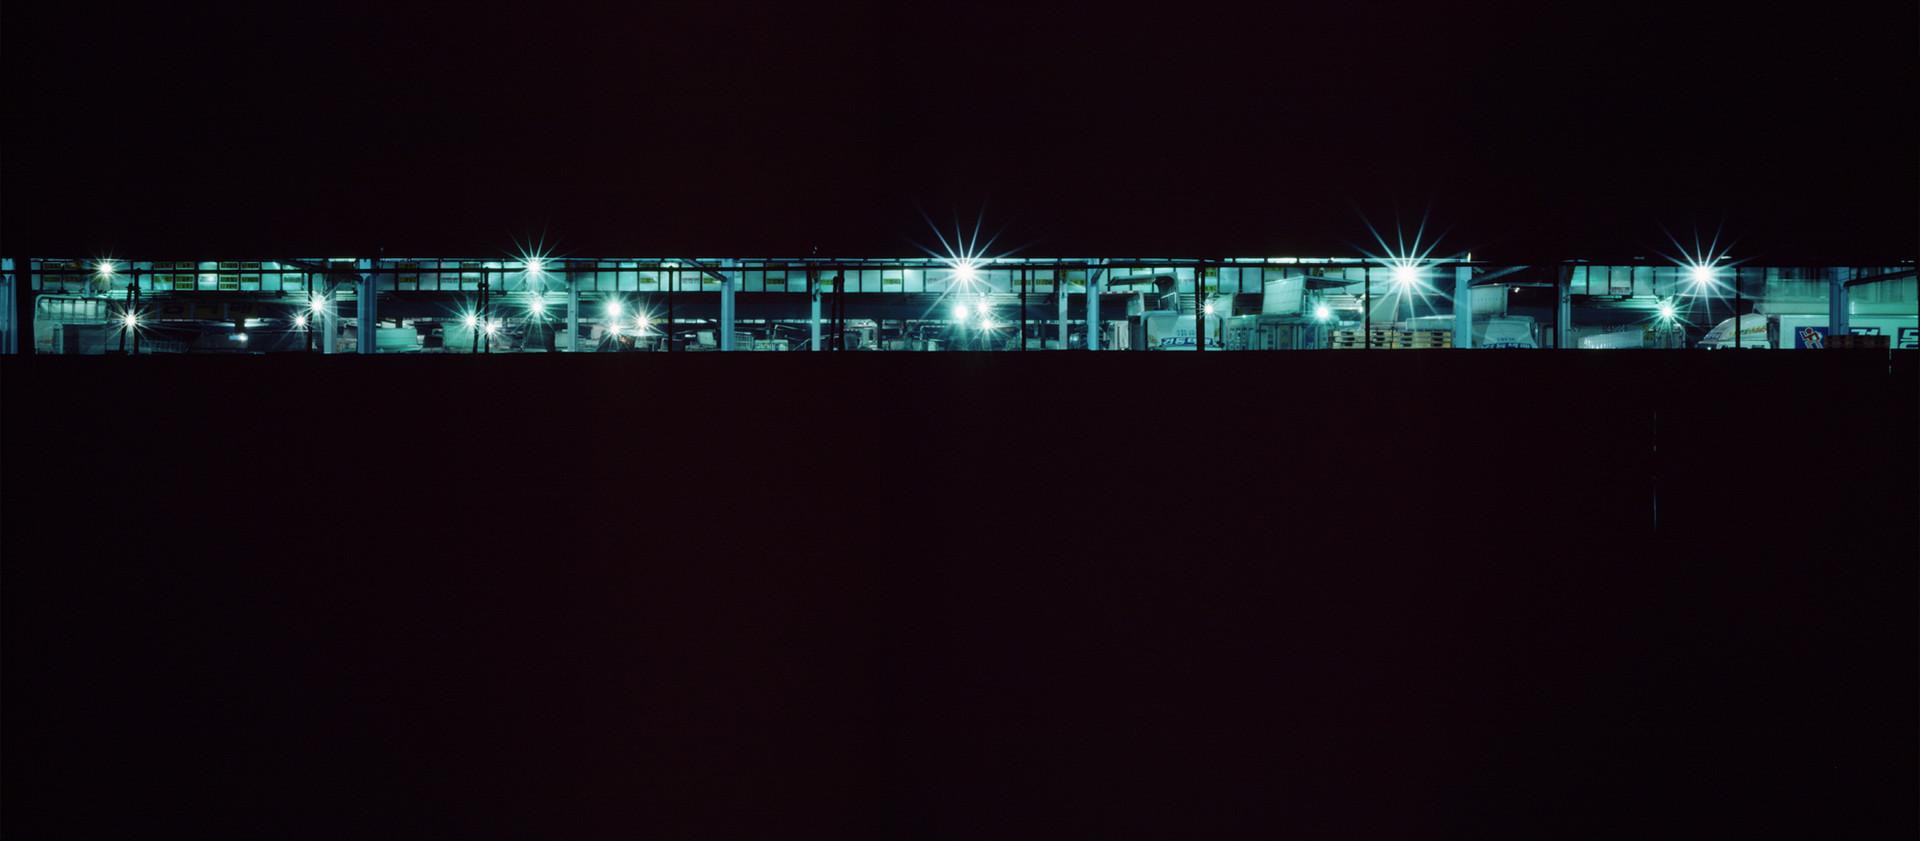 Urban Light-10, C-print, 88x200cm, 2012